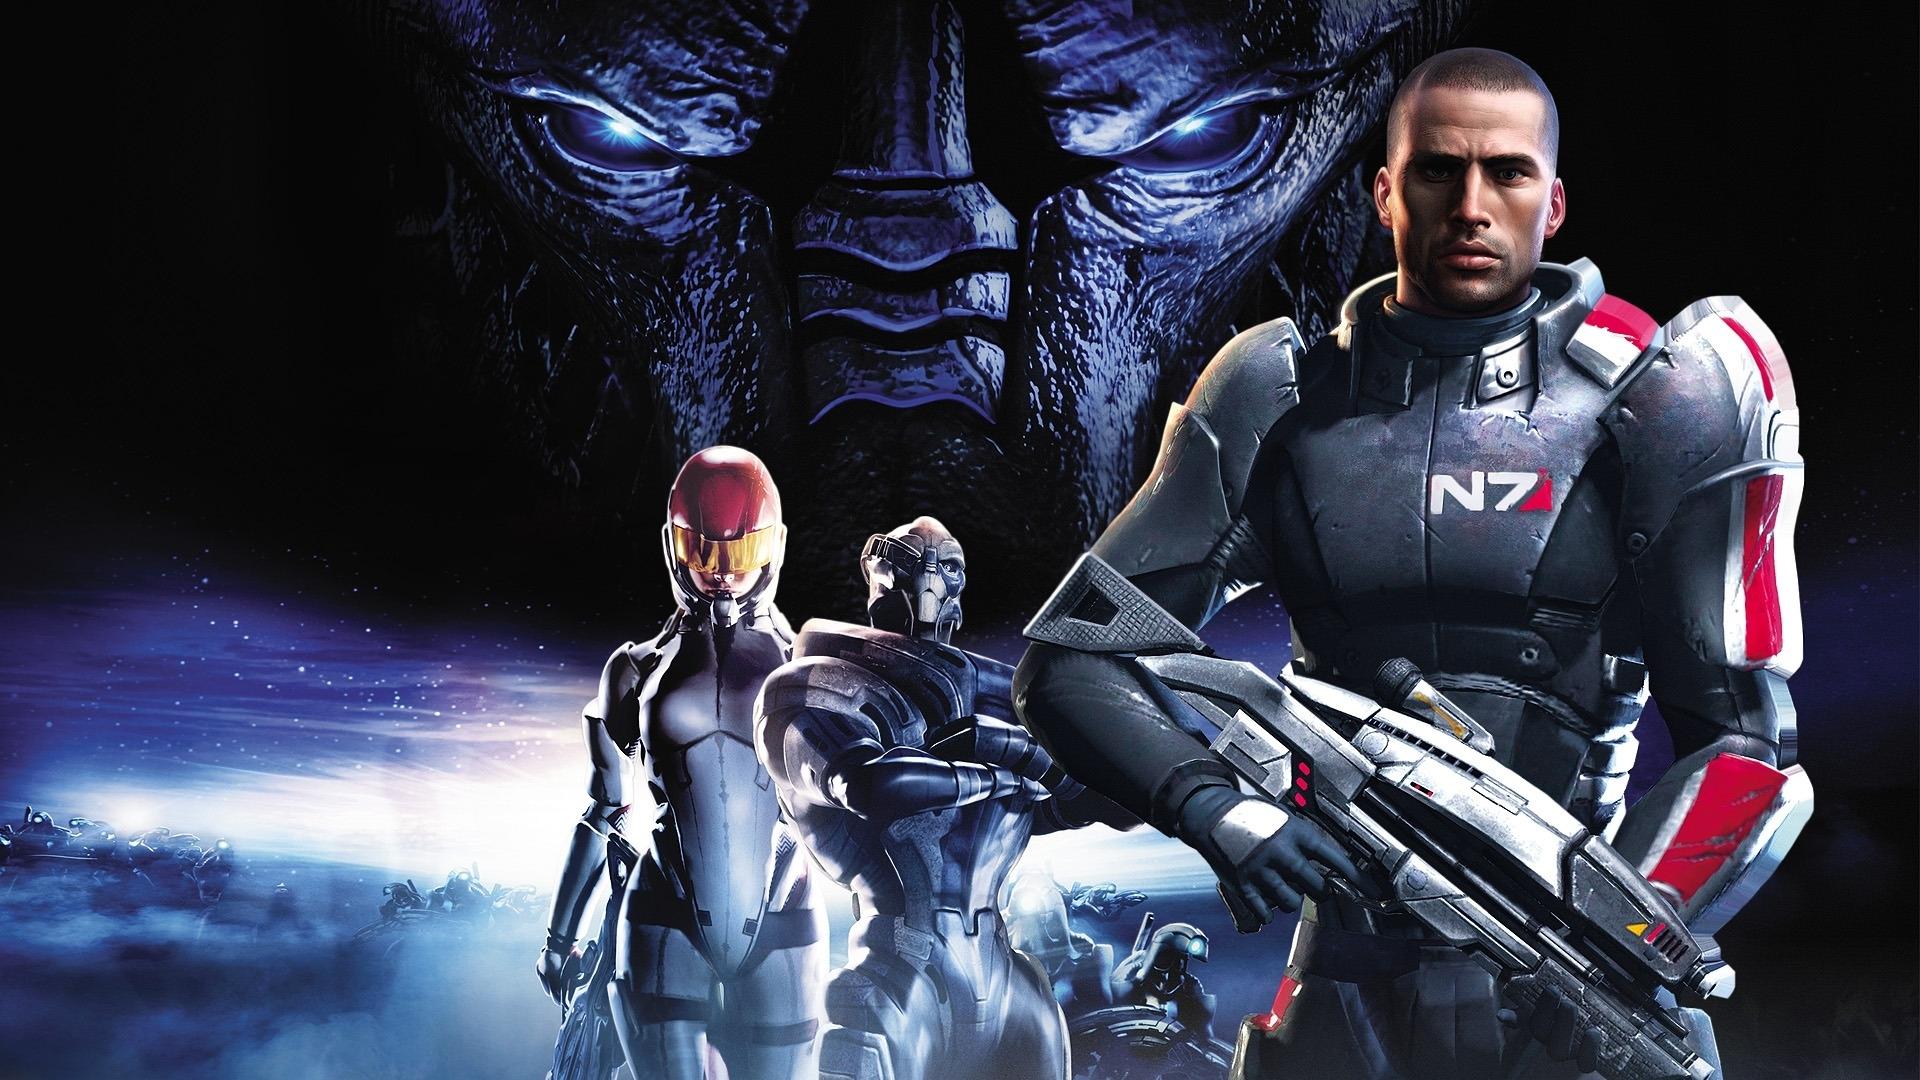 10 Best Mass Effect 1 Wallpaper Full Hd 1080p For Pc Background 2018